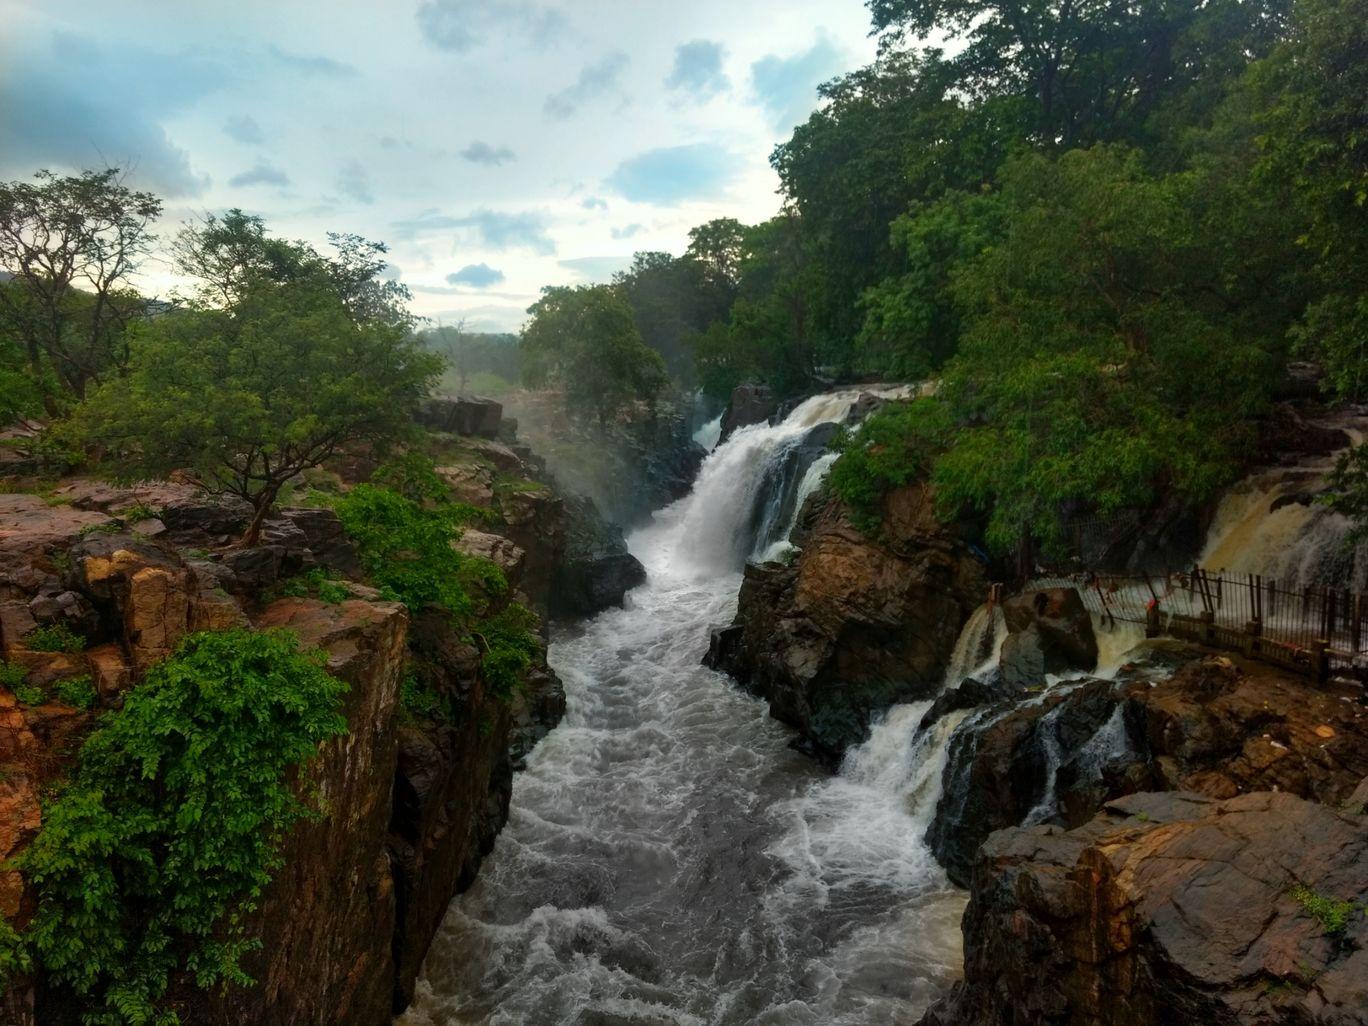 Photo of Hogenakkal Waterfalls By Mohd Hamzah